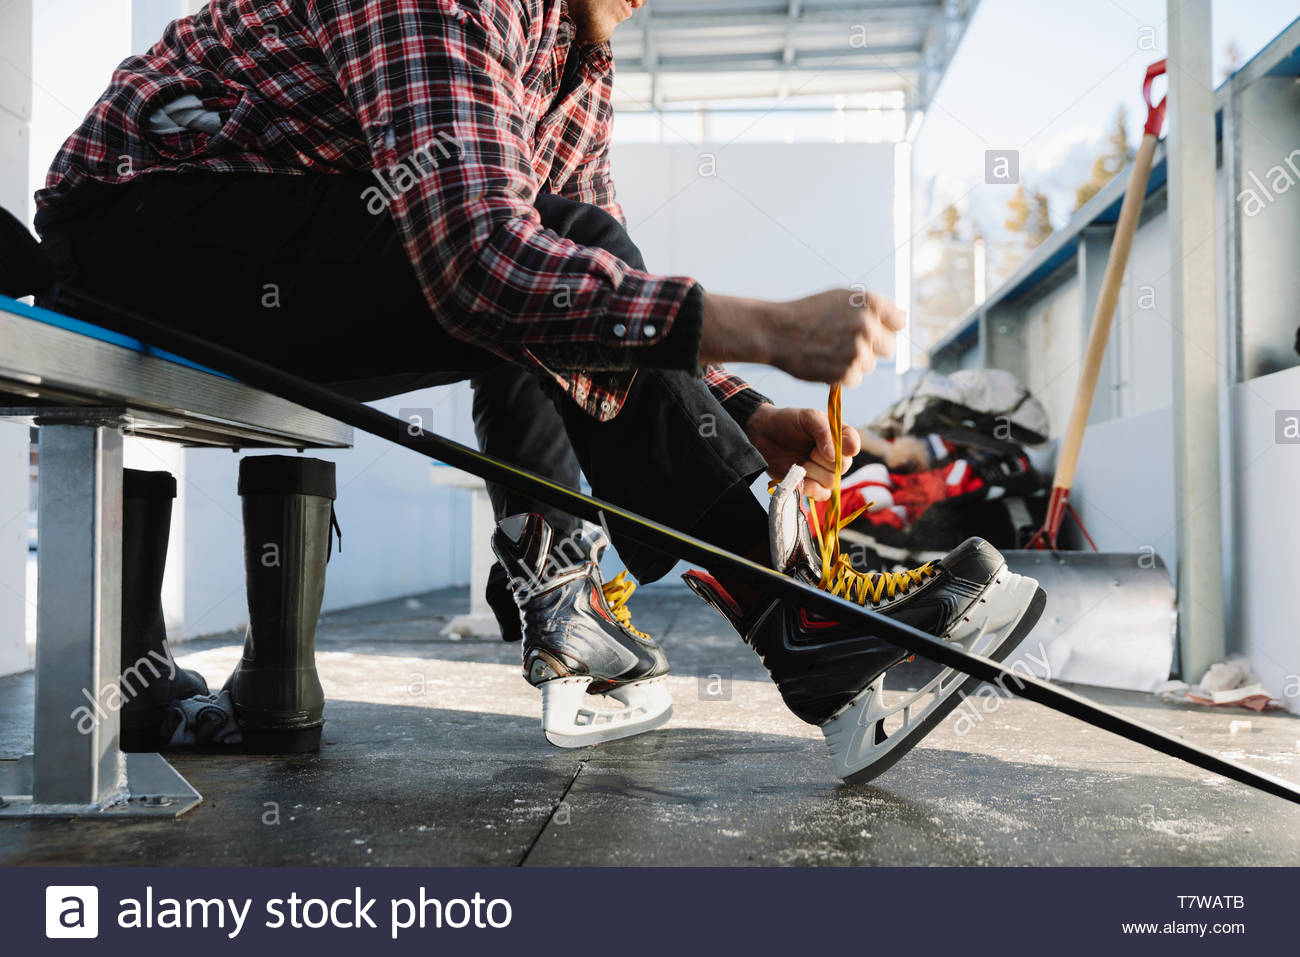 Man tying ice skate, preparing for outdoor ice hockey - Stock Image